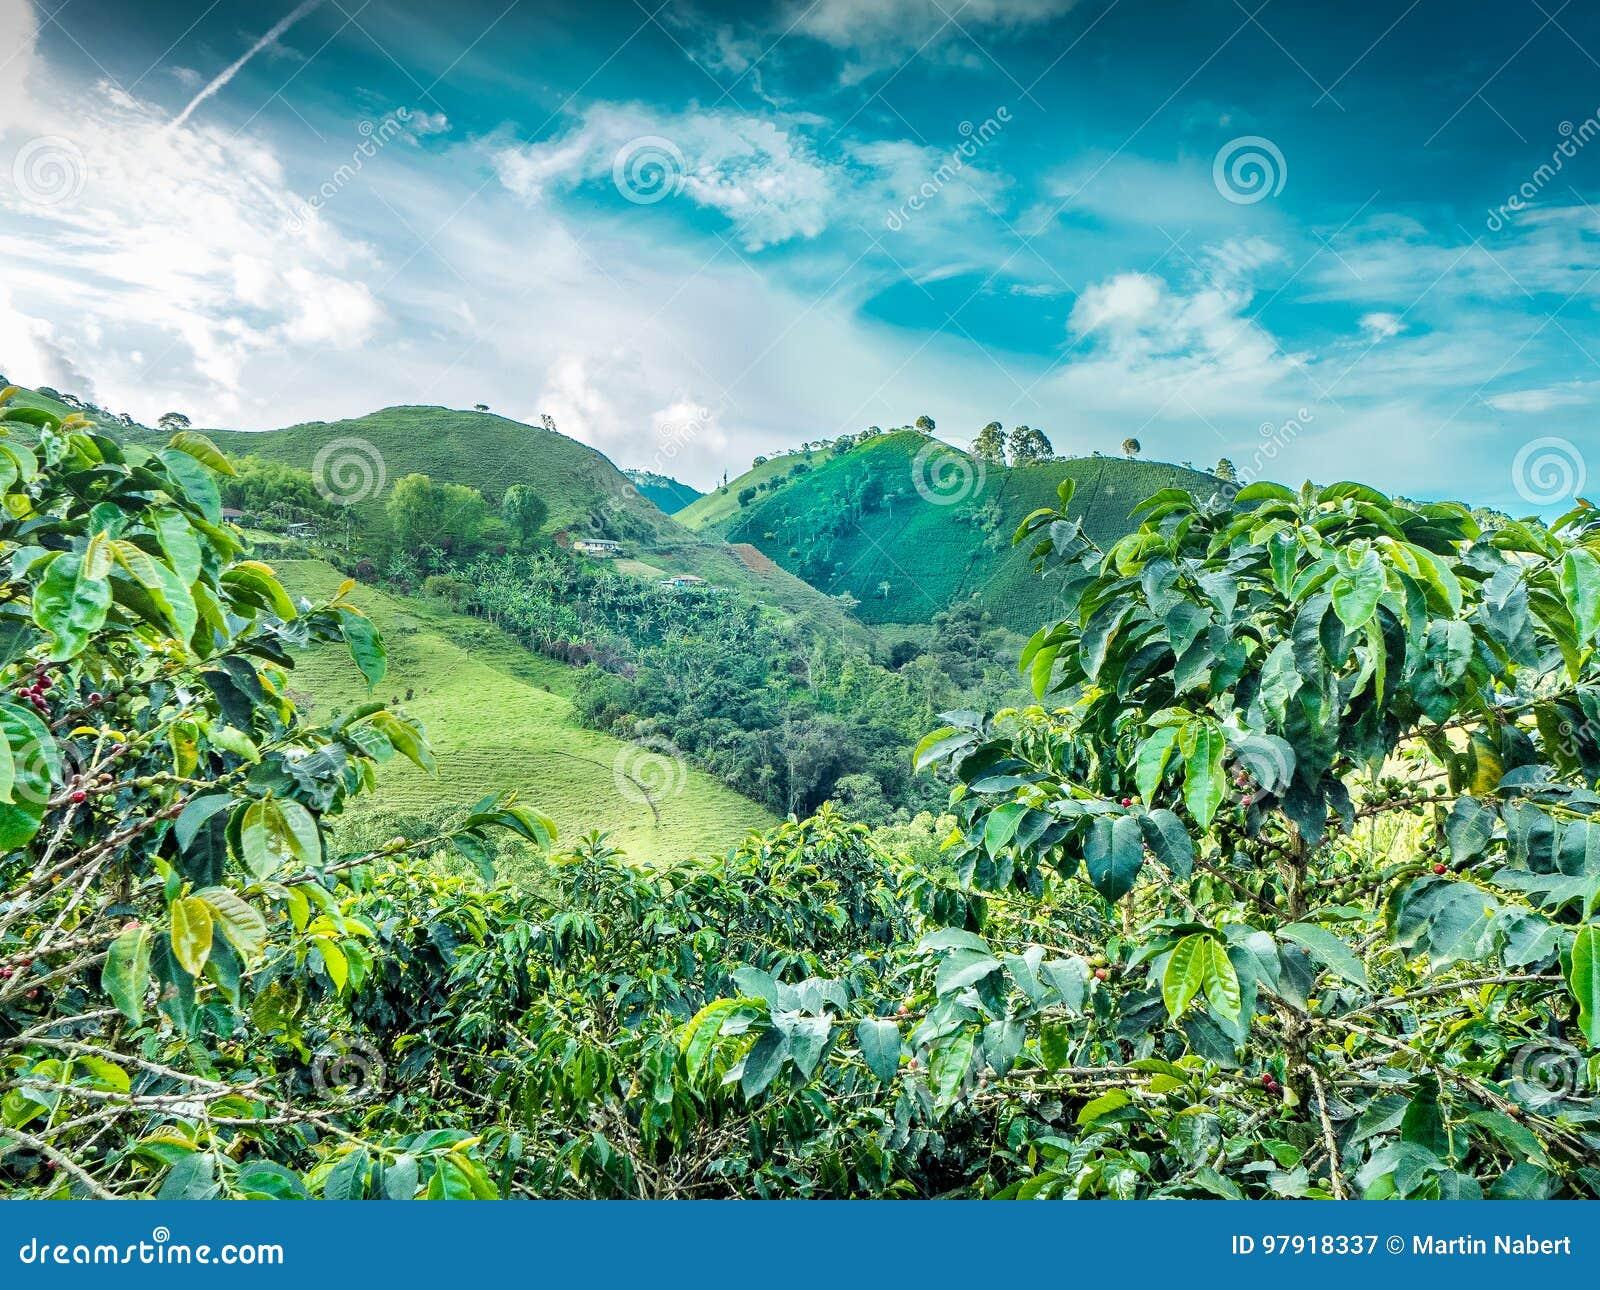 Coffee Mountain Jerico, Colombia